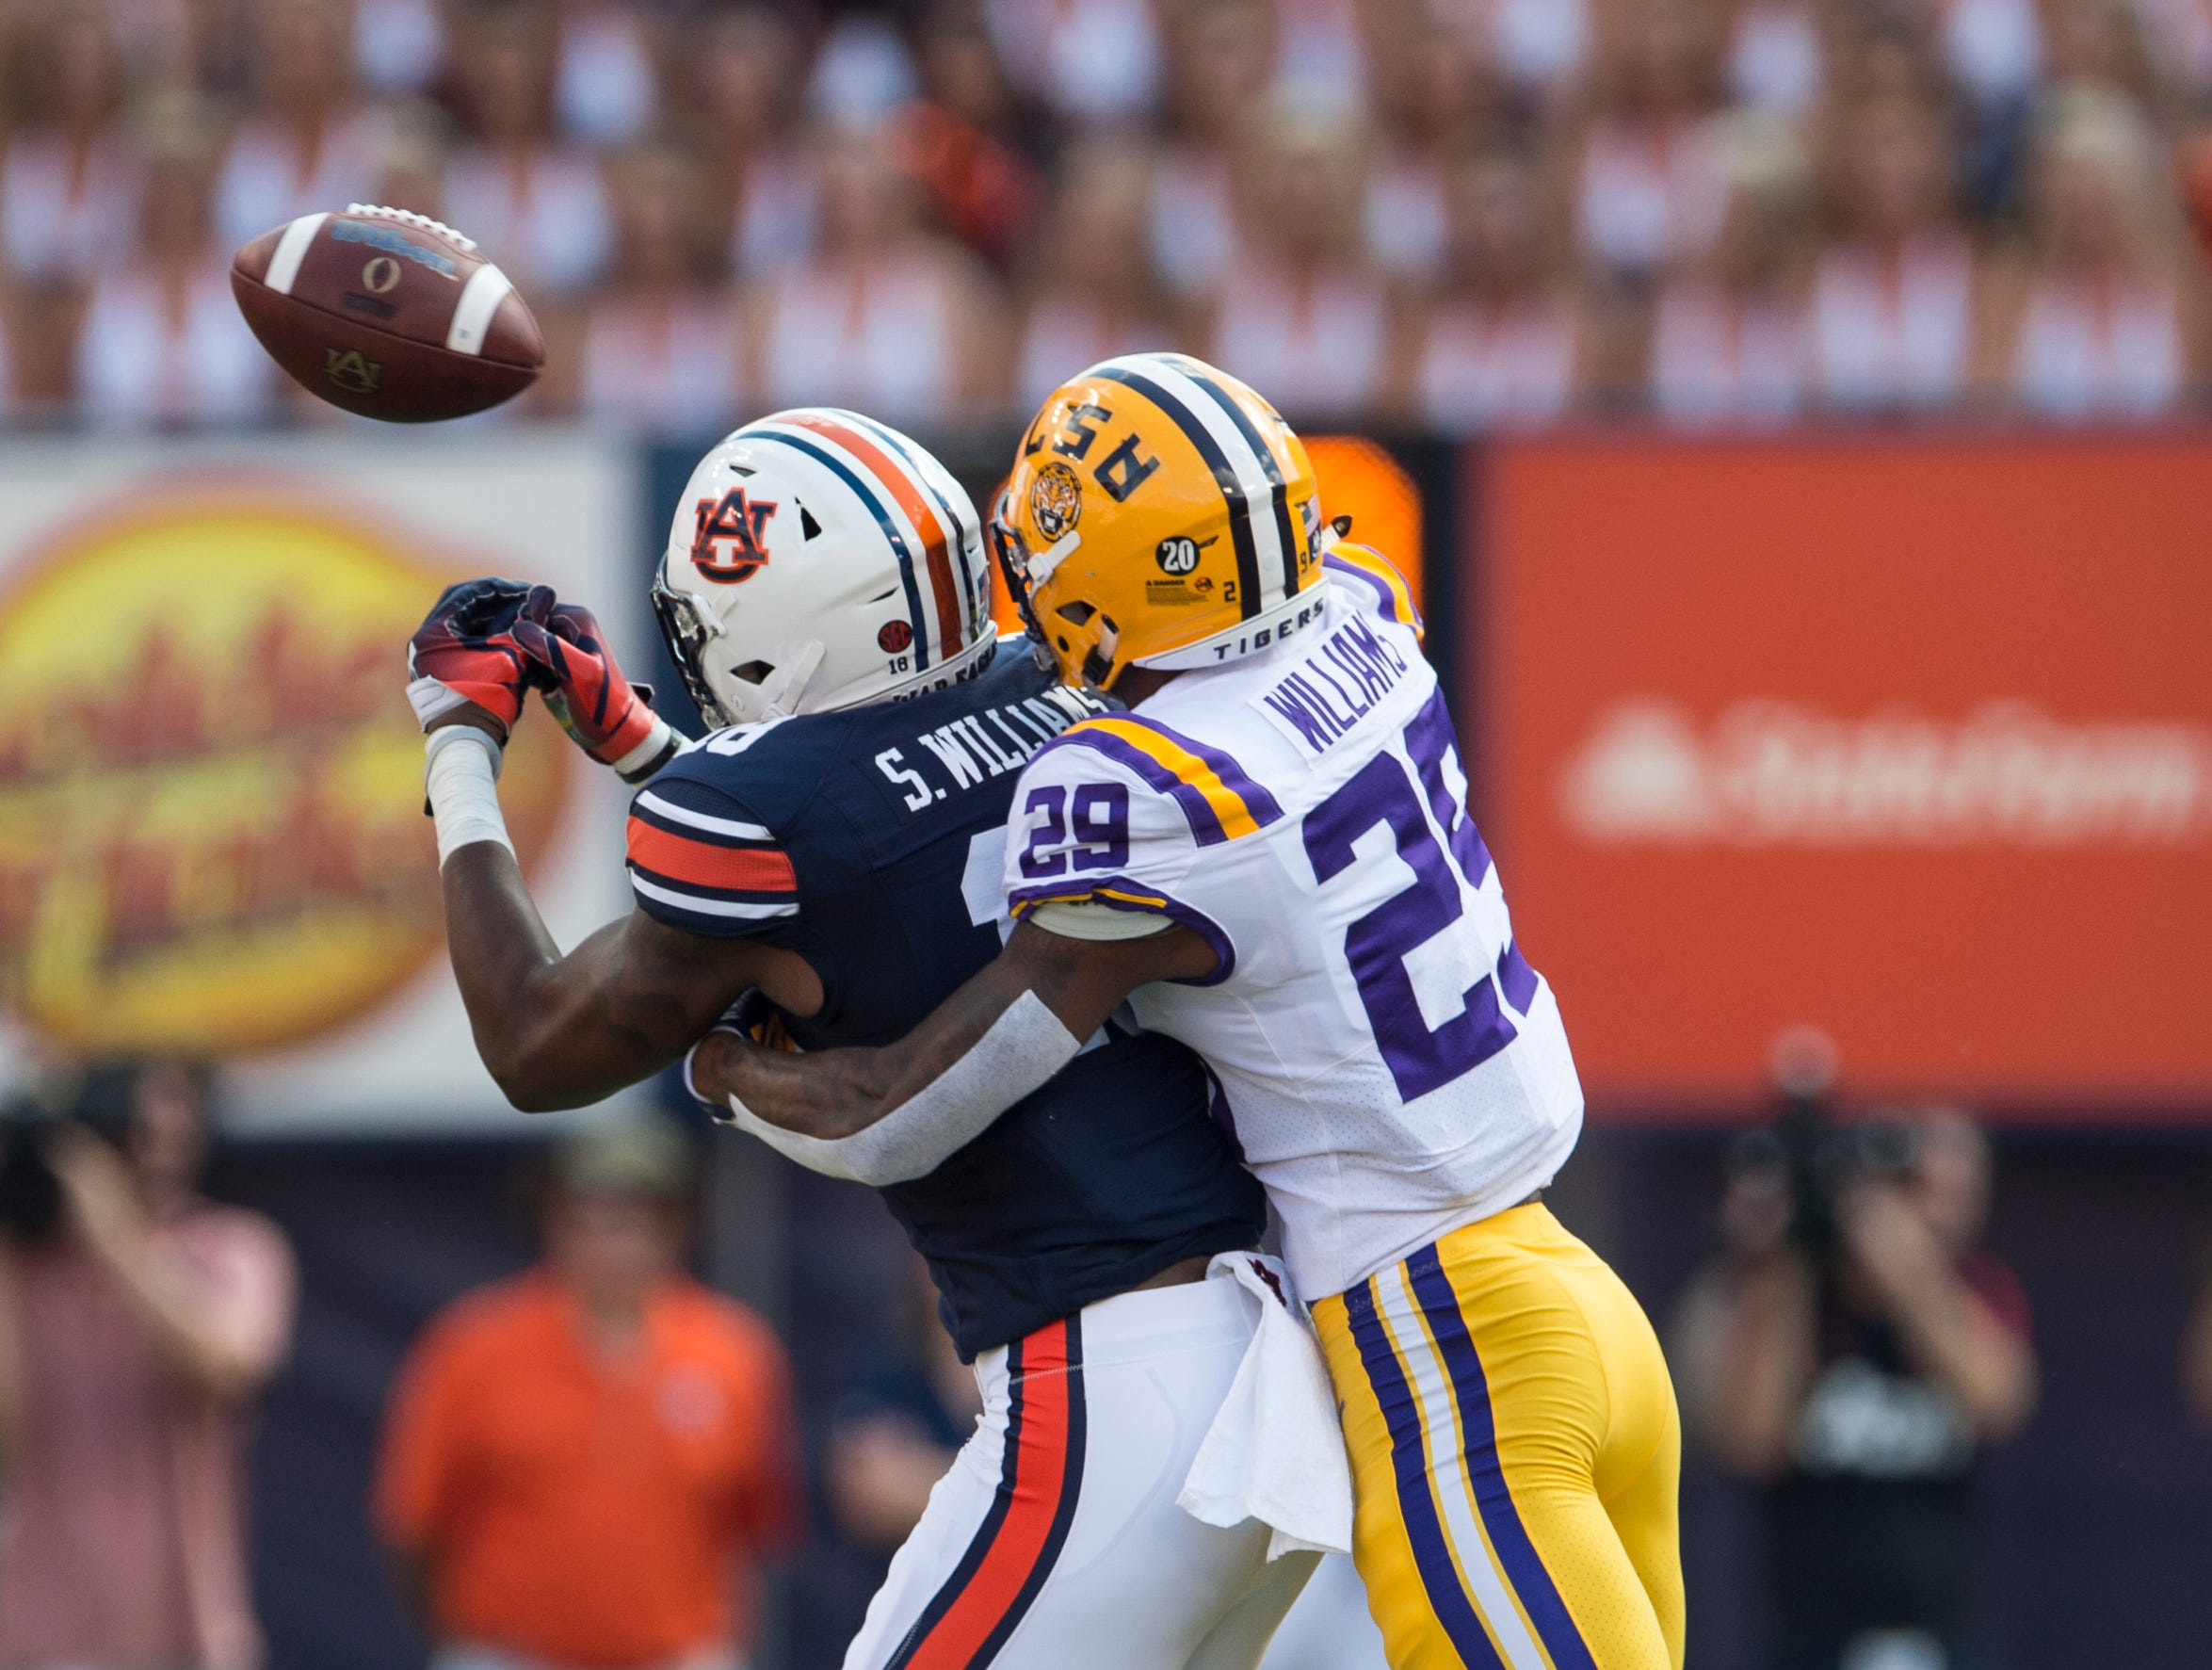 Auburn's Seth Williams (18) misses a catch guarded by LSU's Greedy Williams (29) at Jordan-Hare Stadium in Auburn, Ala., on Saturday, Sept. 15, 2018. LSU defeated Auburn 22-21.